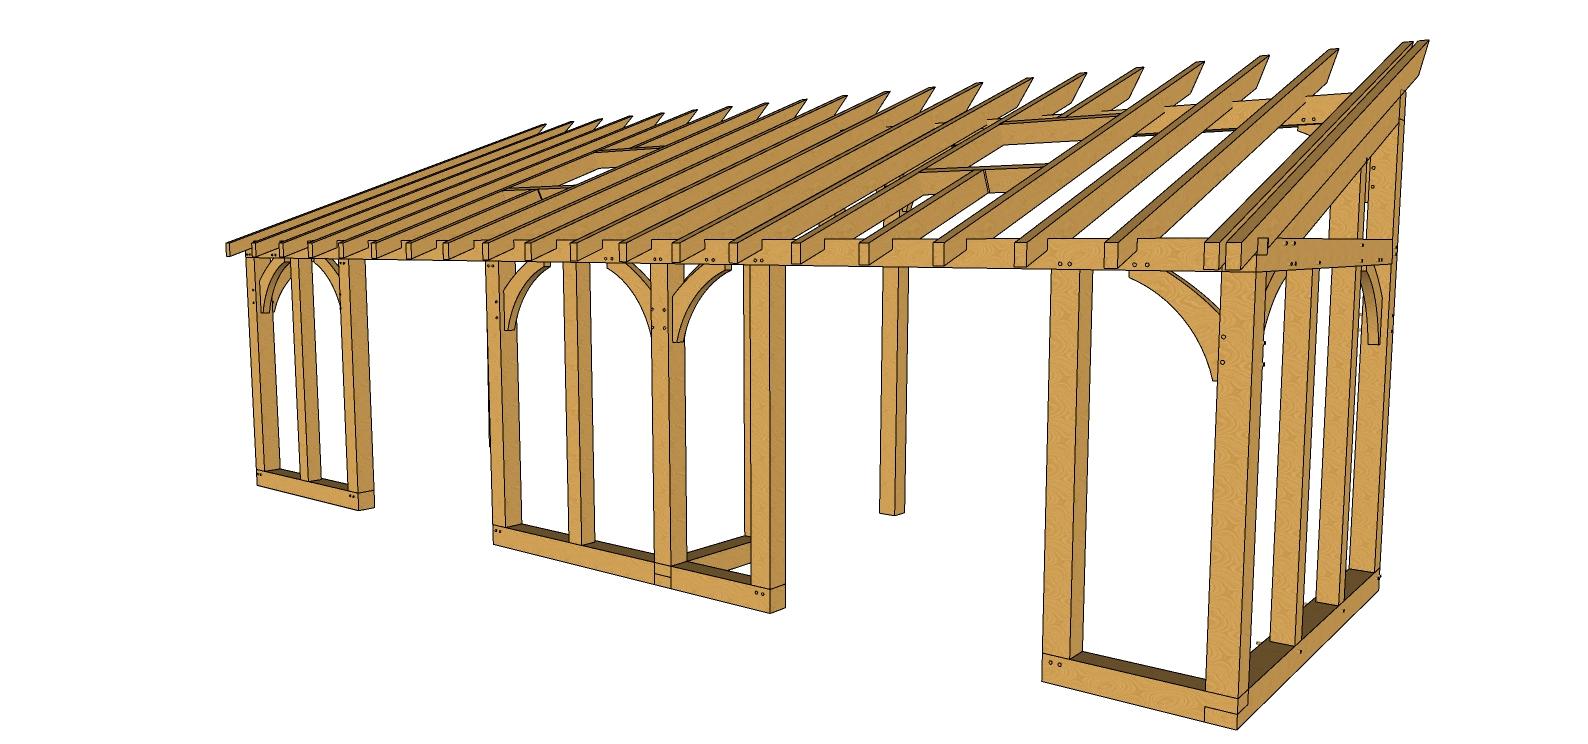 Bespoke lean to oak conservatory design